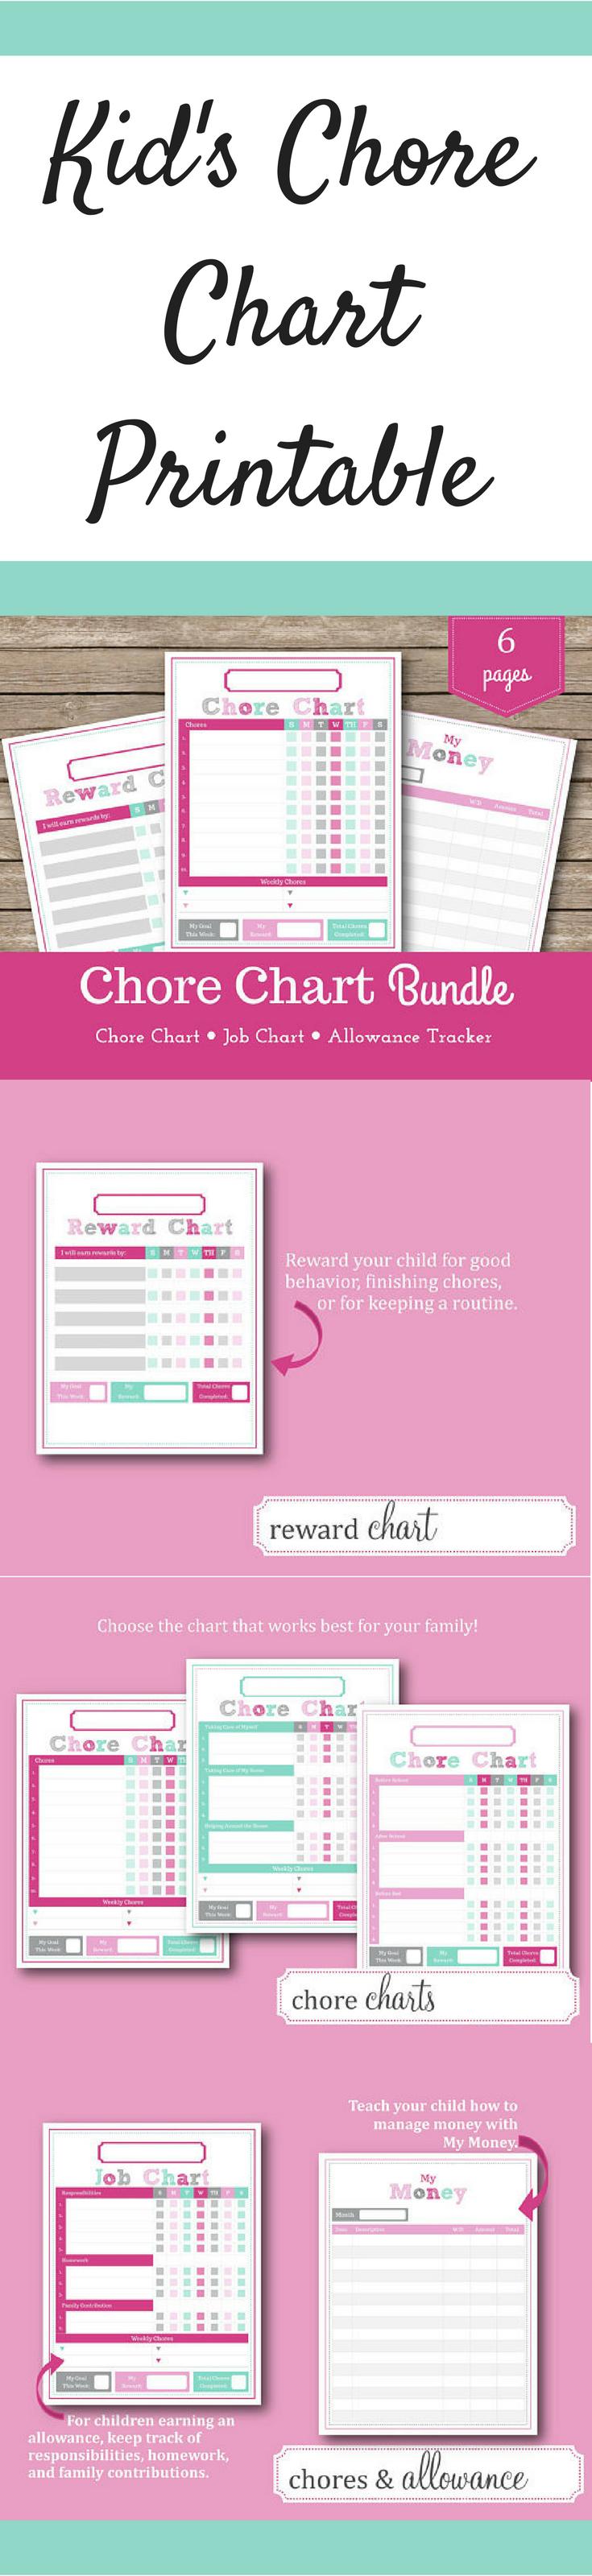 Kid S C Chart And Rewards Printable Allowance Tracker Ad Cs Paing